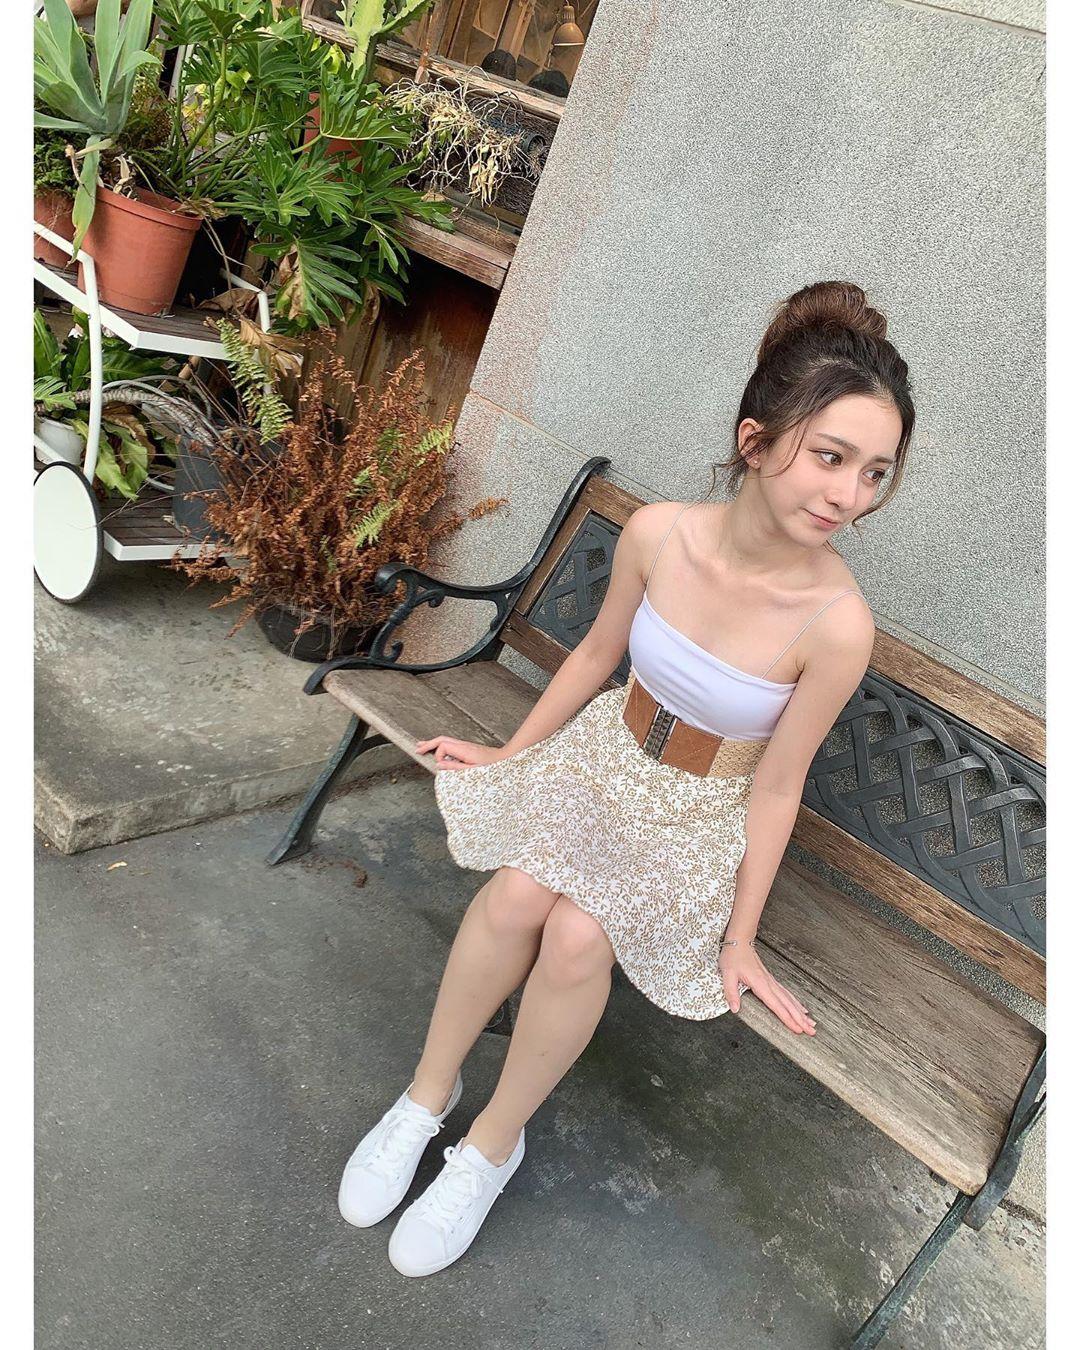 HKMAjTf0 o - IG正妹—盧蓁 Lucy